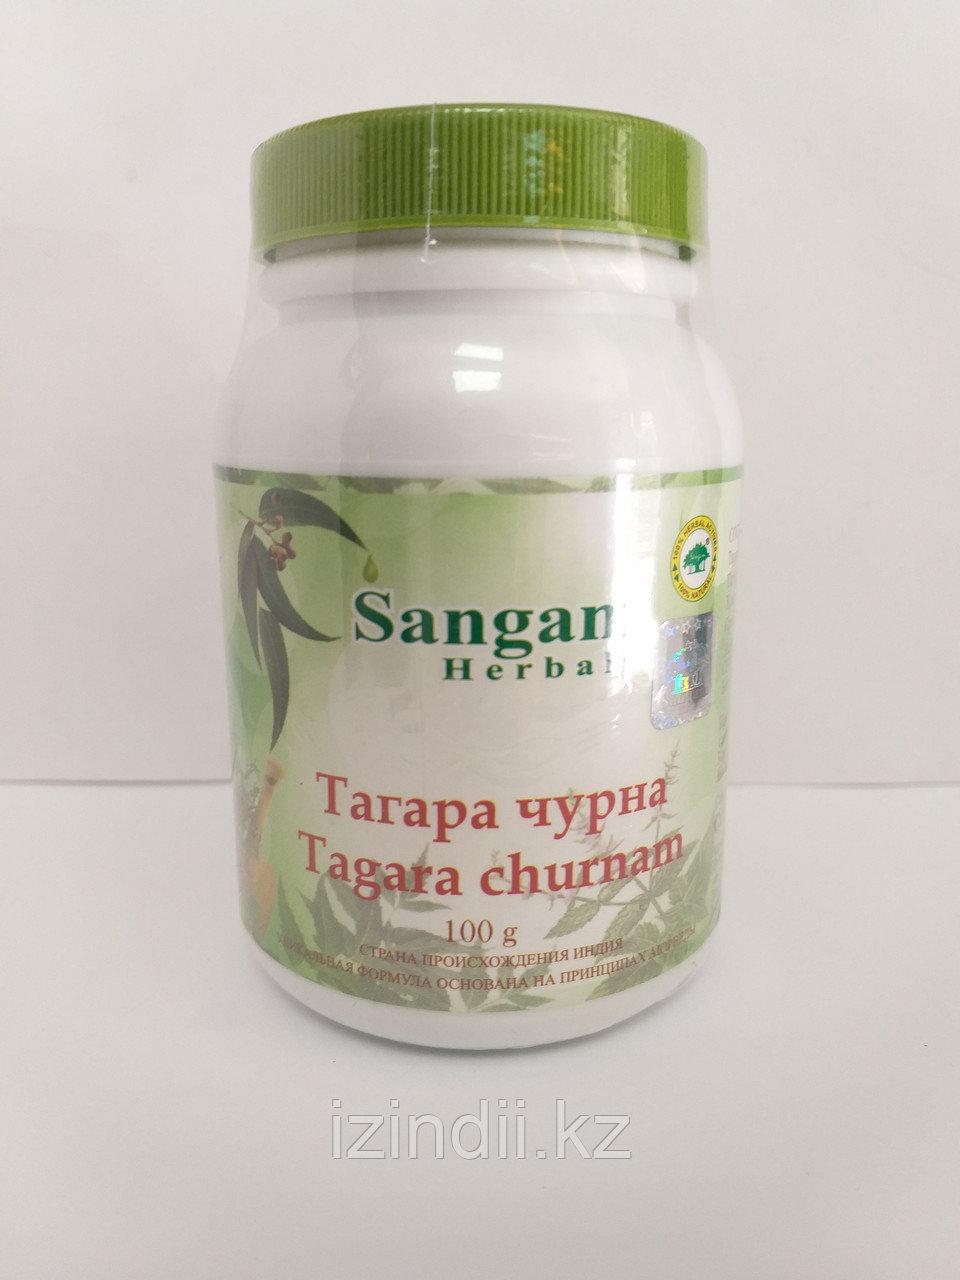 Тагара порошок , 100 гр,  Tagara churnam, Sangam Herbals